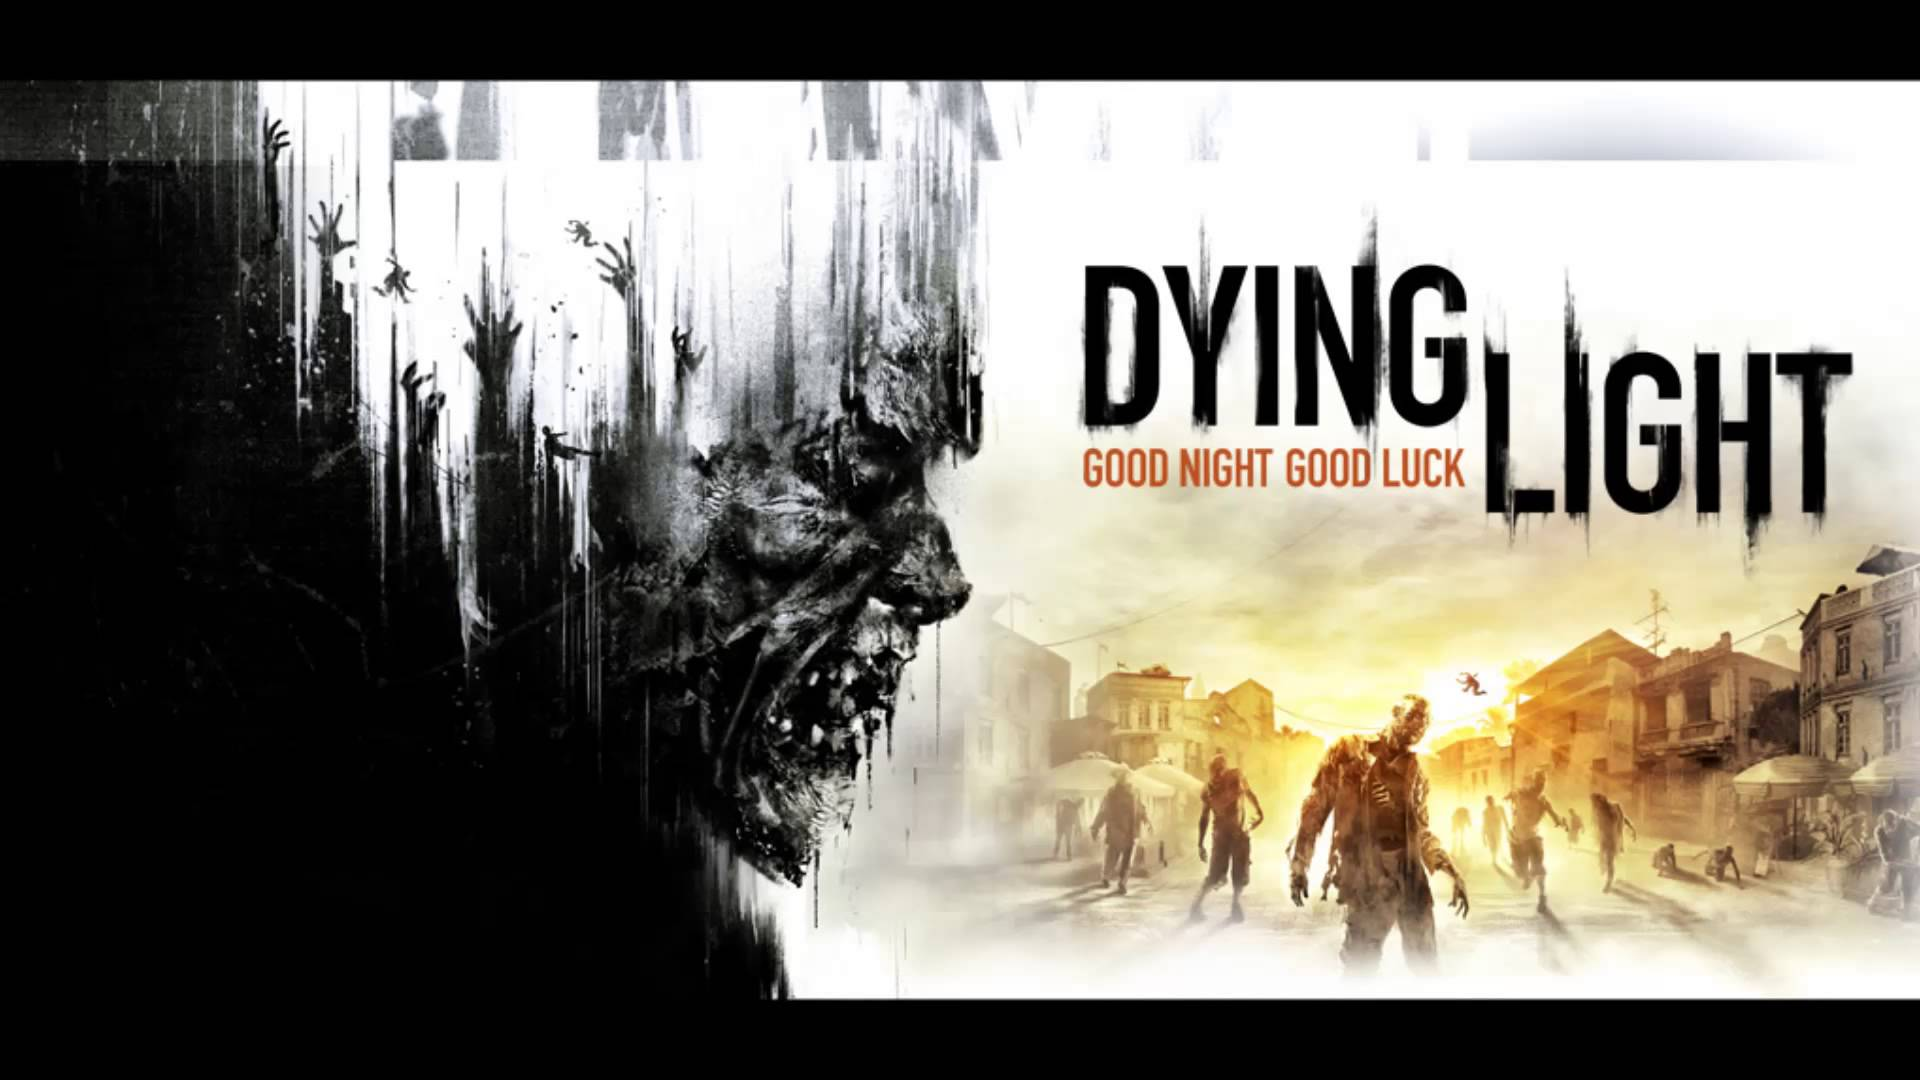 Dying Light Game Wallpaper Computer Desktop Background 76890jpg 1920x1080